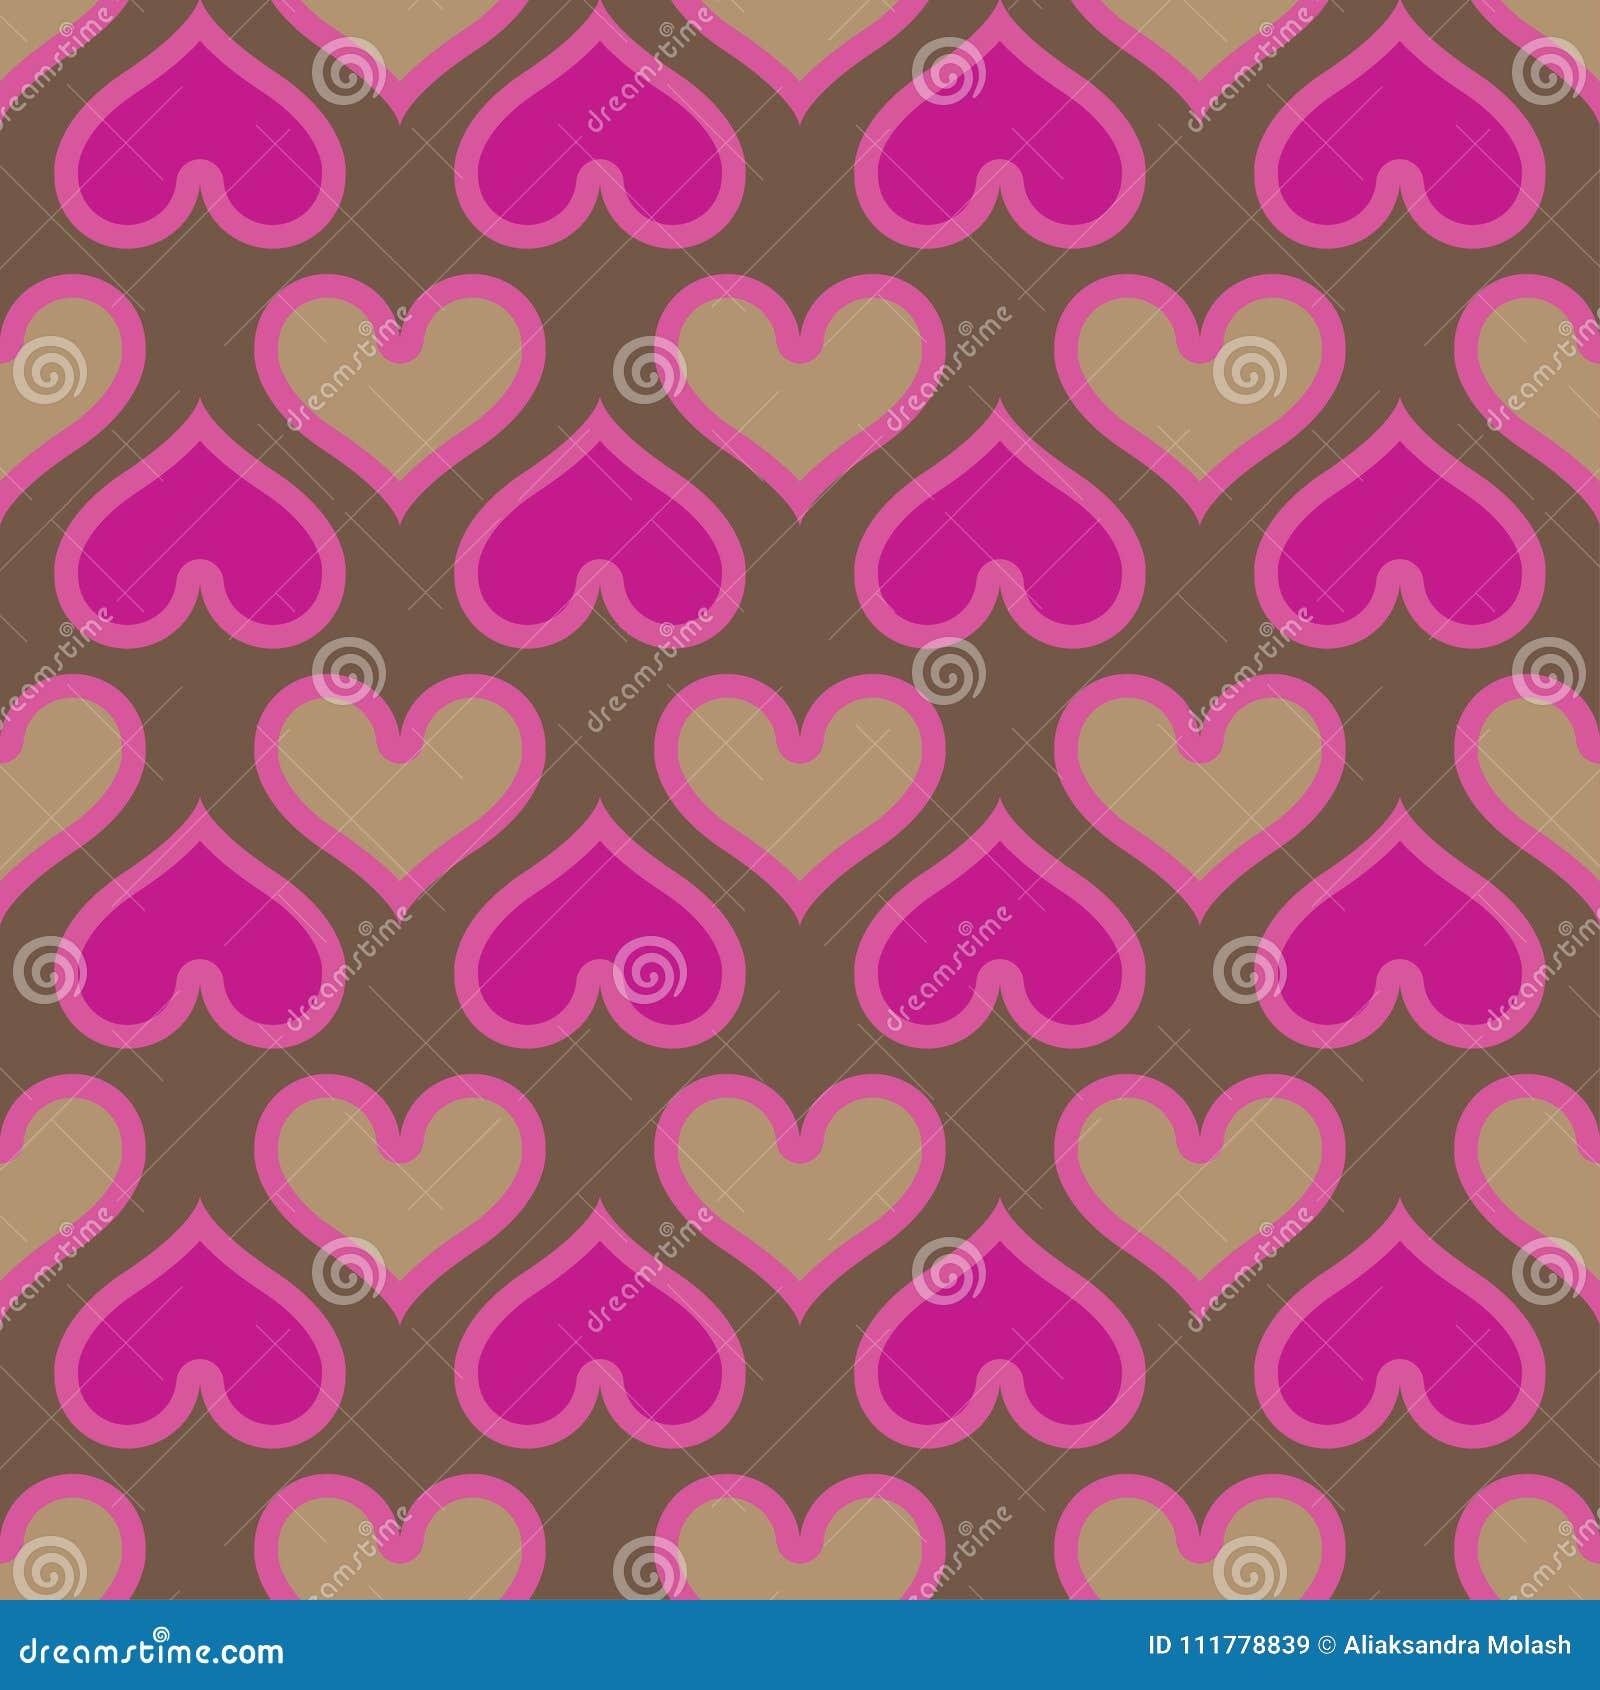 Pink hearts seamless background pattern